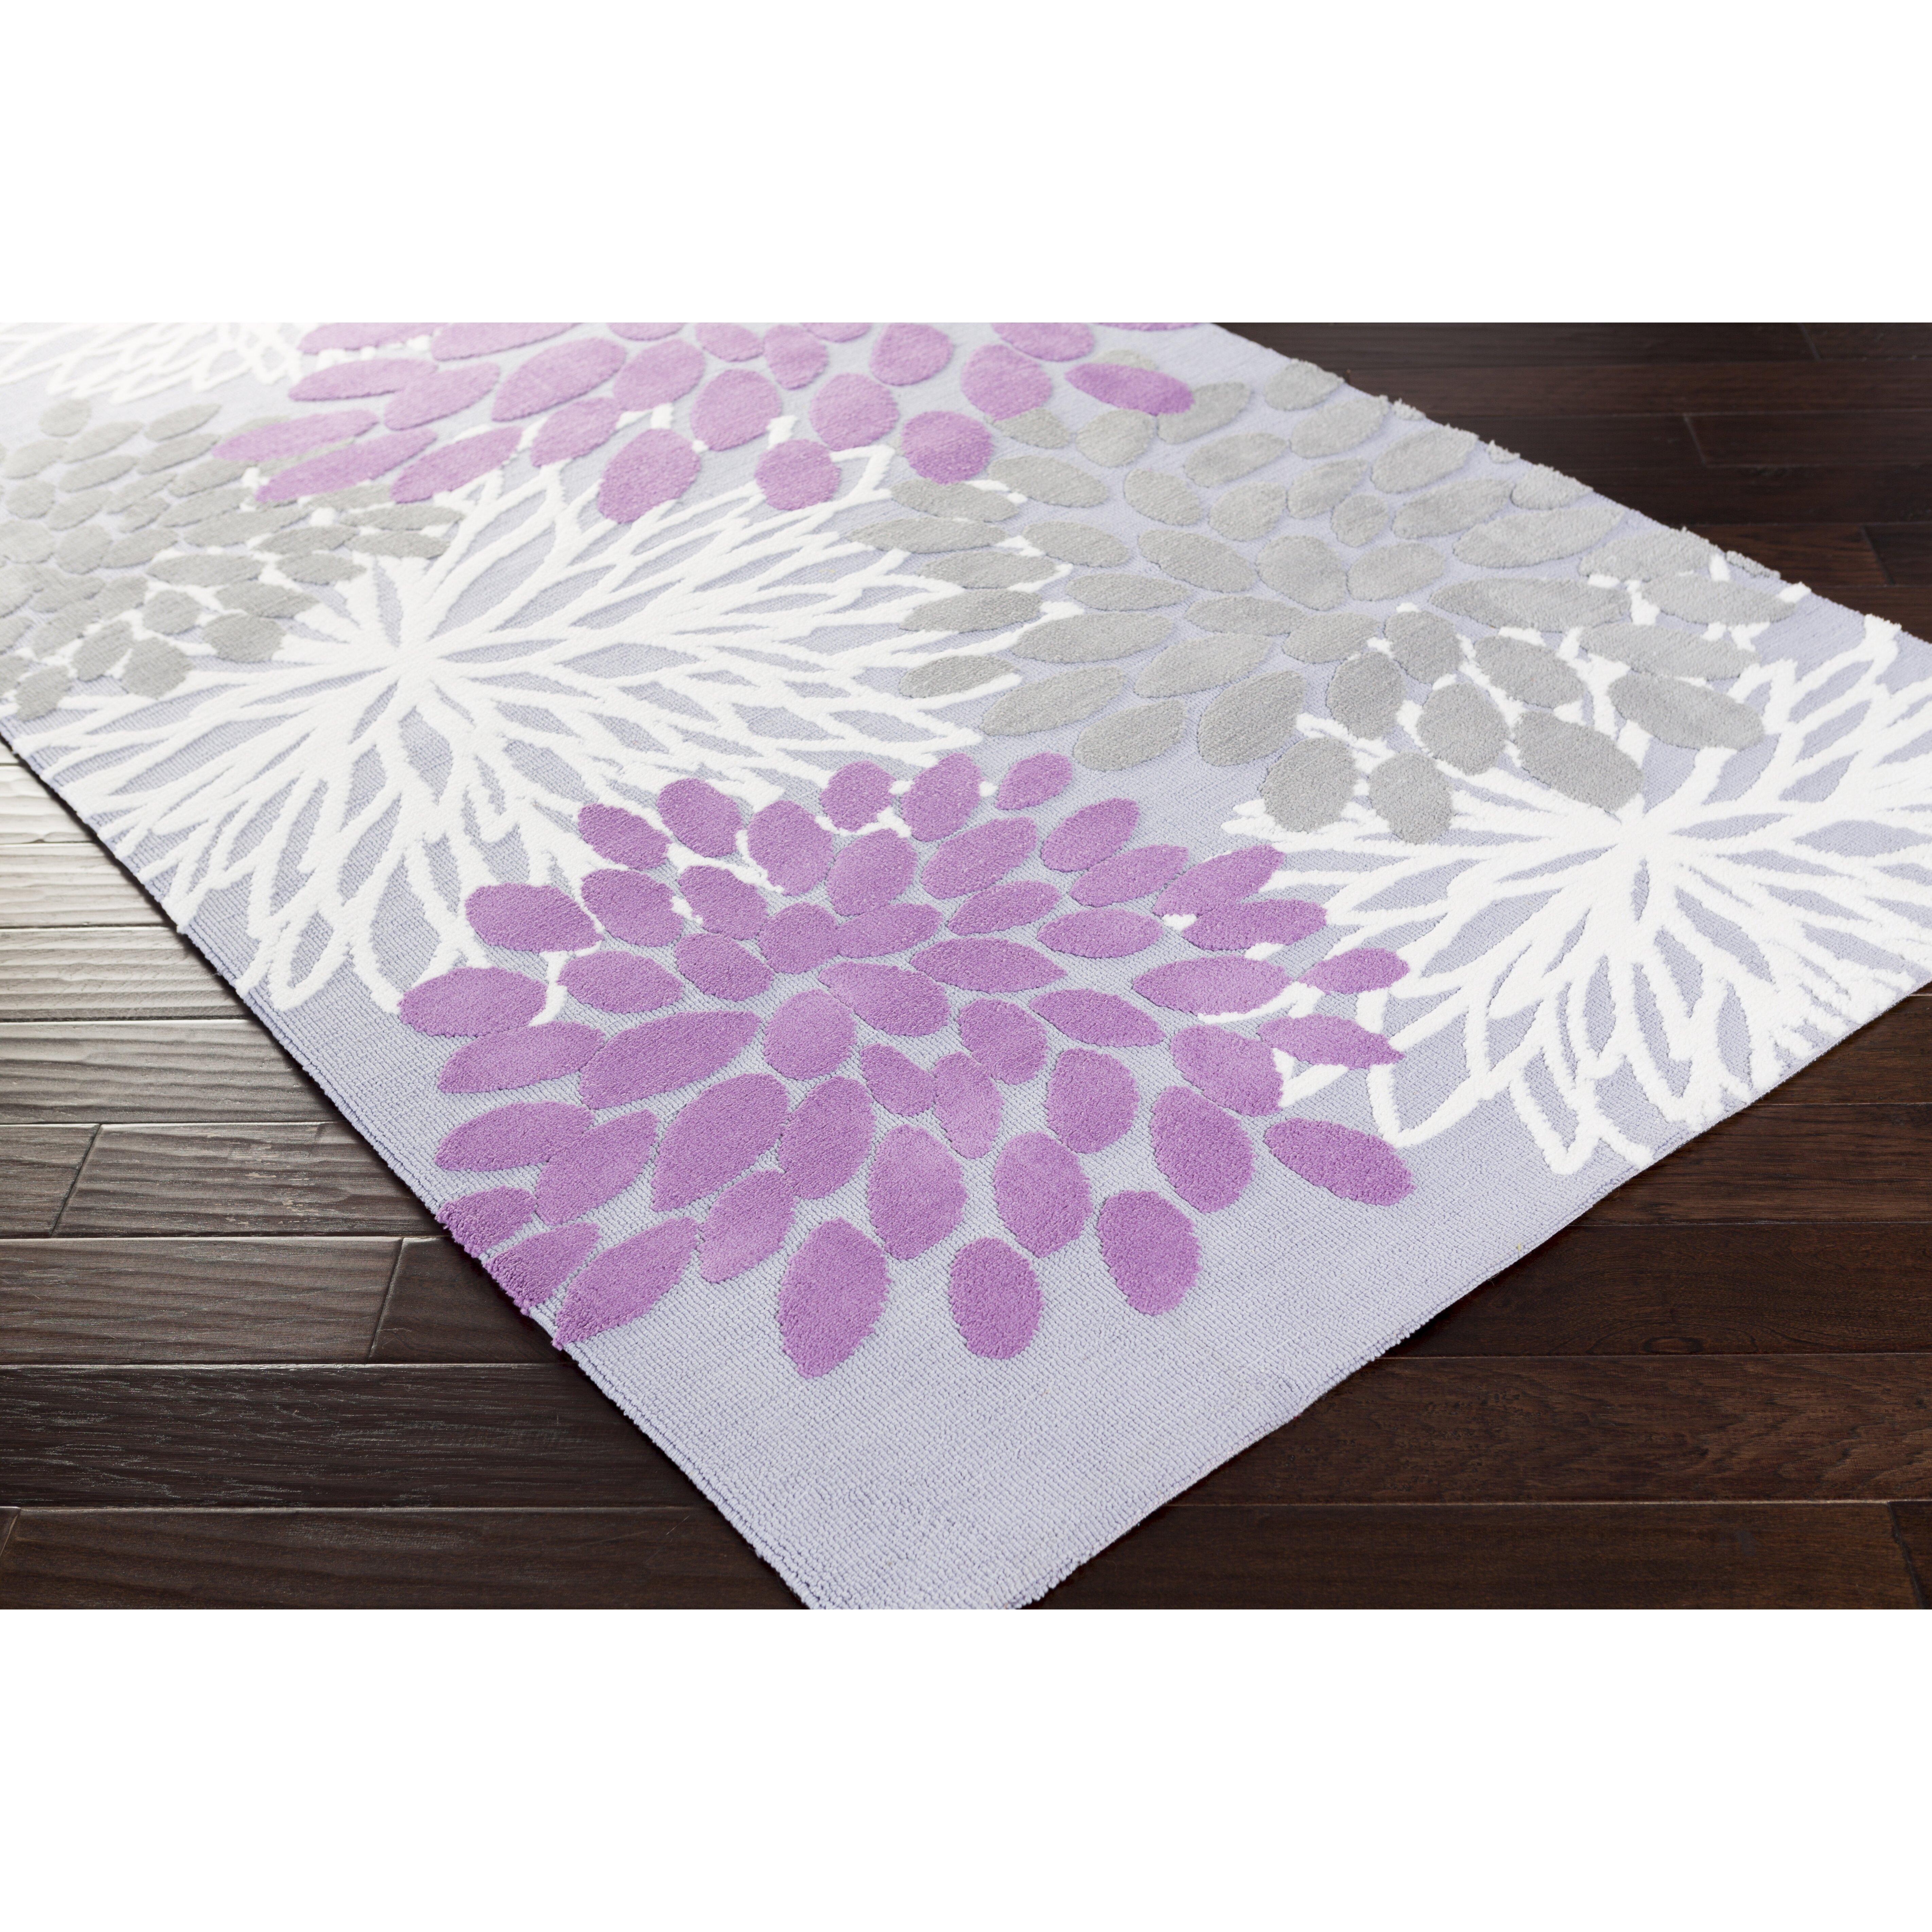 Surya Abigail Lavender/Gray Area Rug